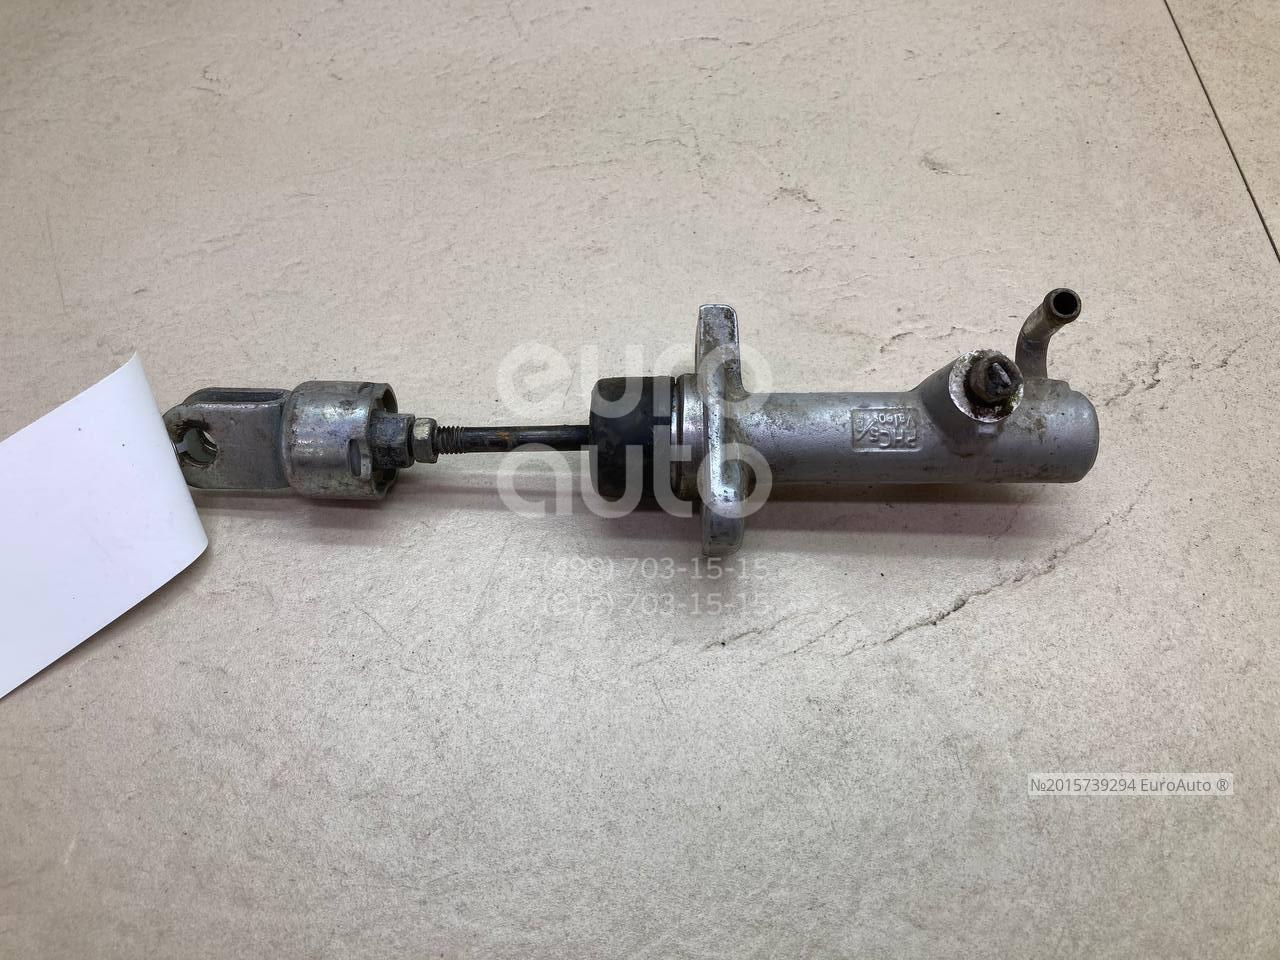 Цилиндр сцепления главный для Chevrolet Lacetti 2003-2013 - Фото №1